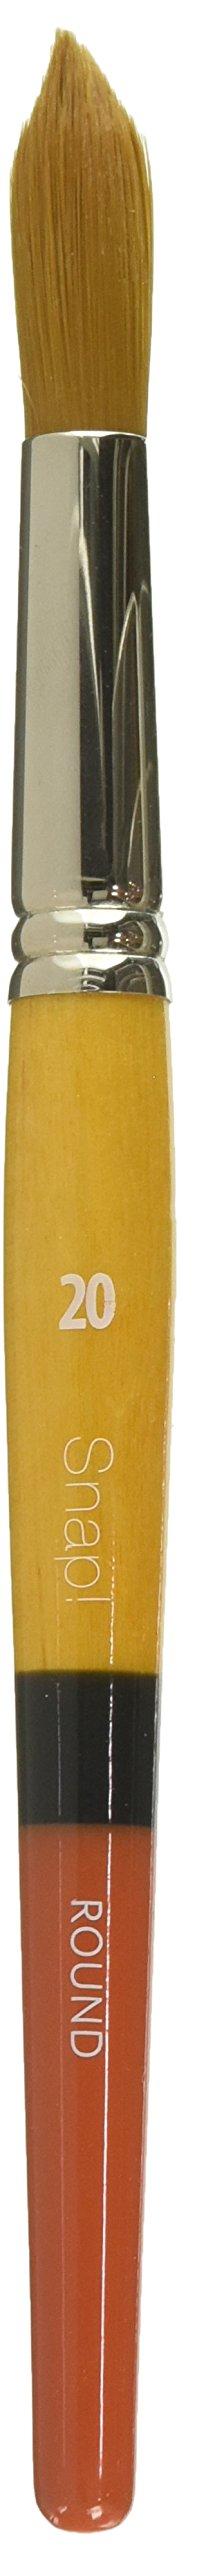 Princeton Snap! 9650R-20 Snap Brush Taklon, Gold by Princeton Snap!